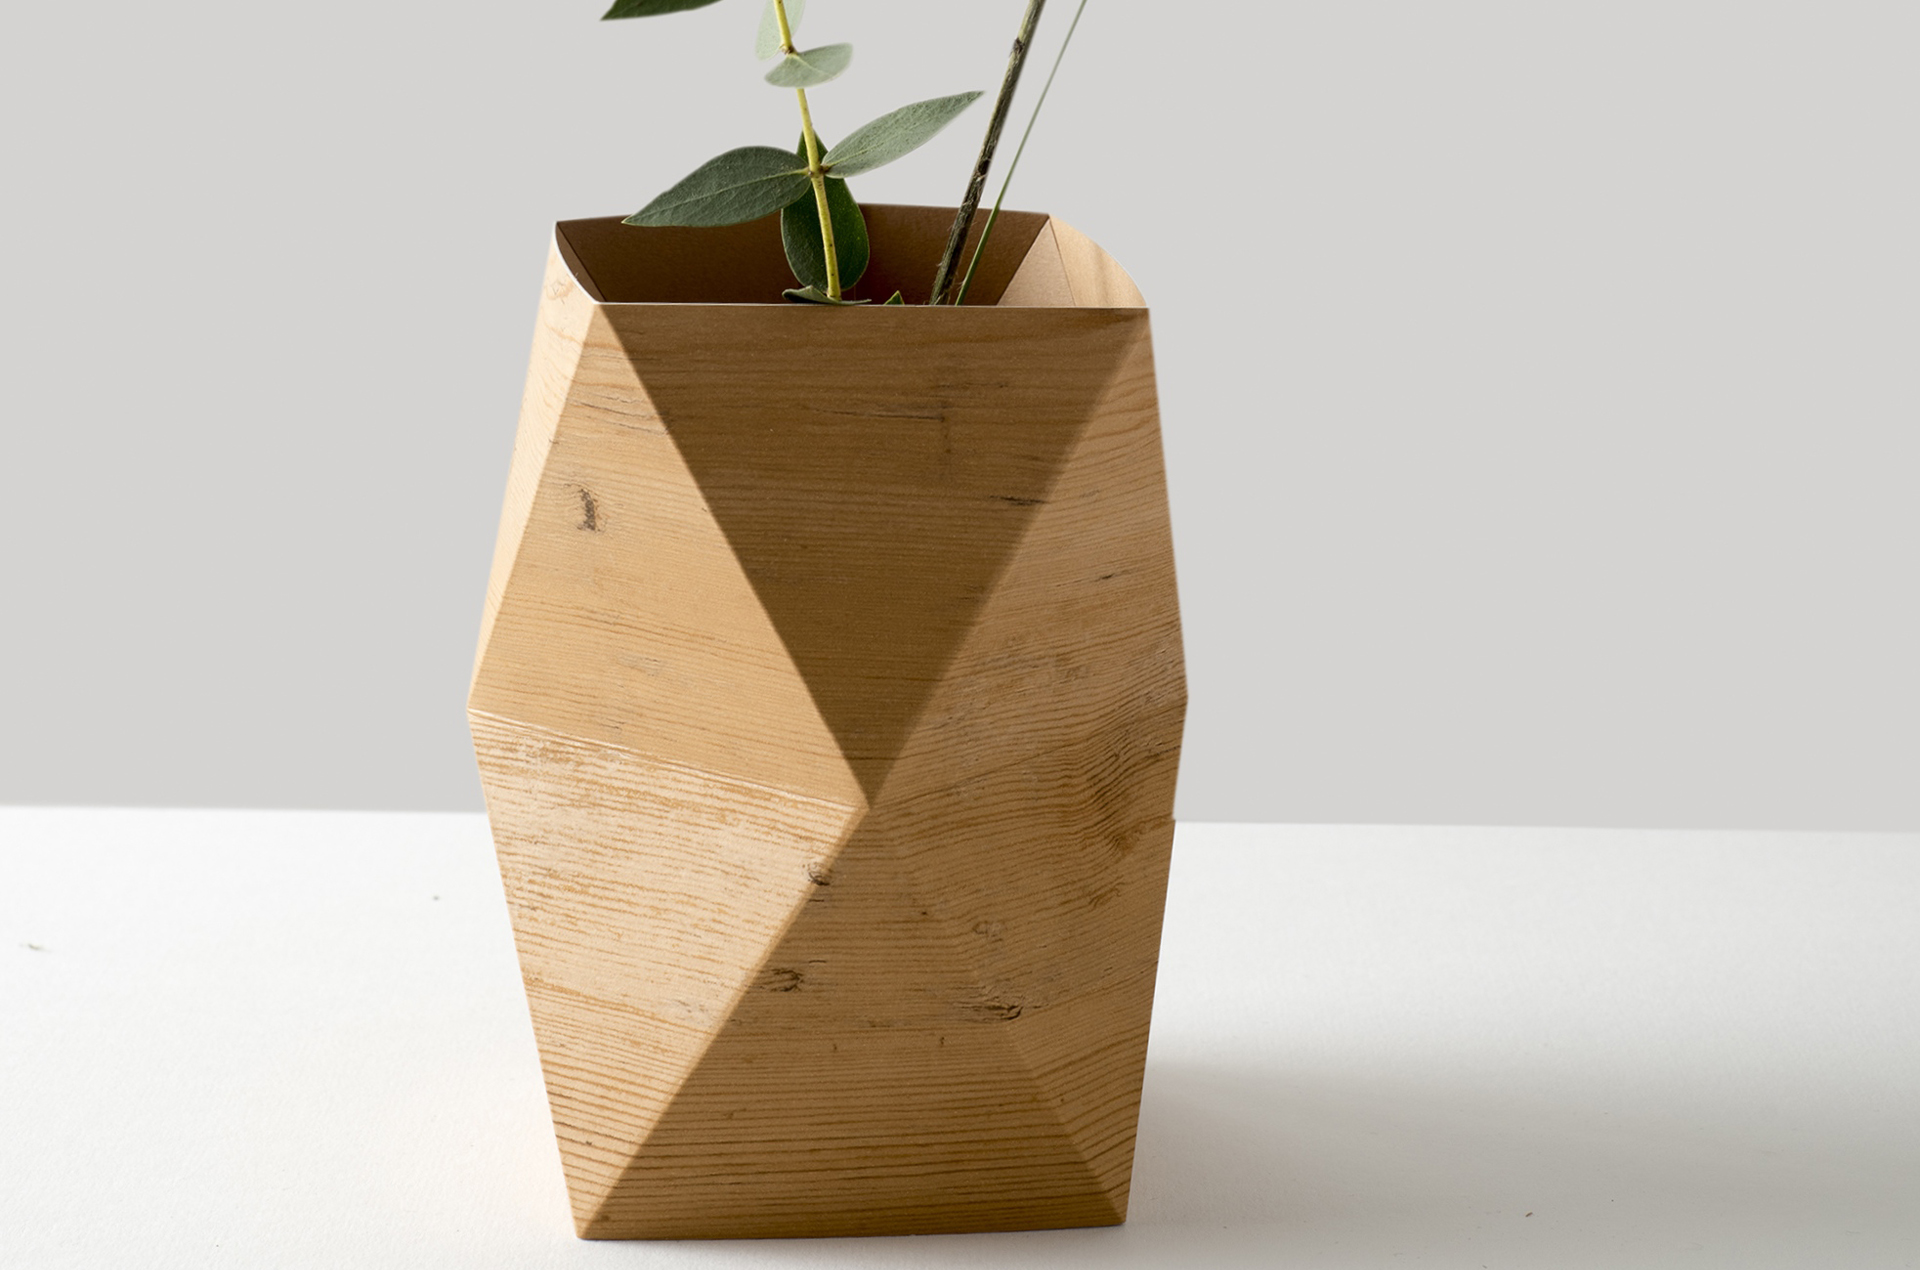 Folded 'wooden' Vase